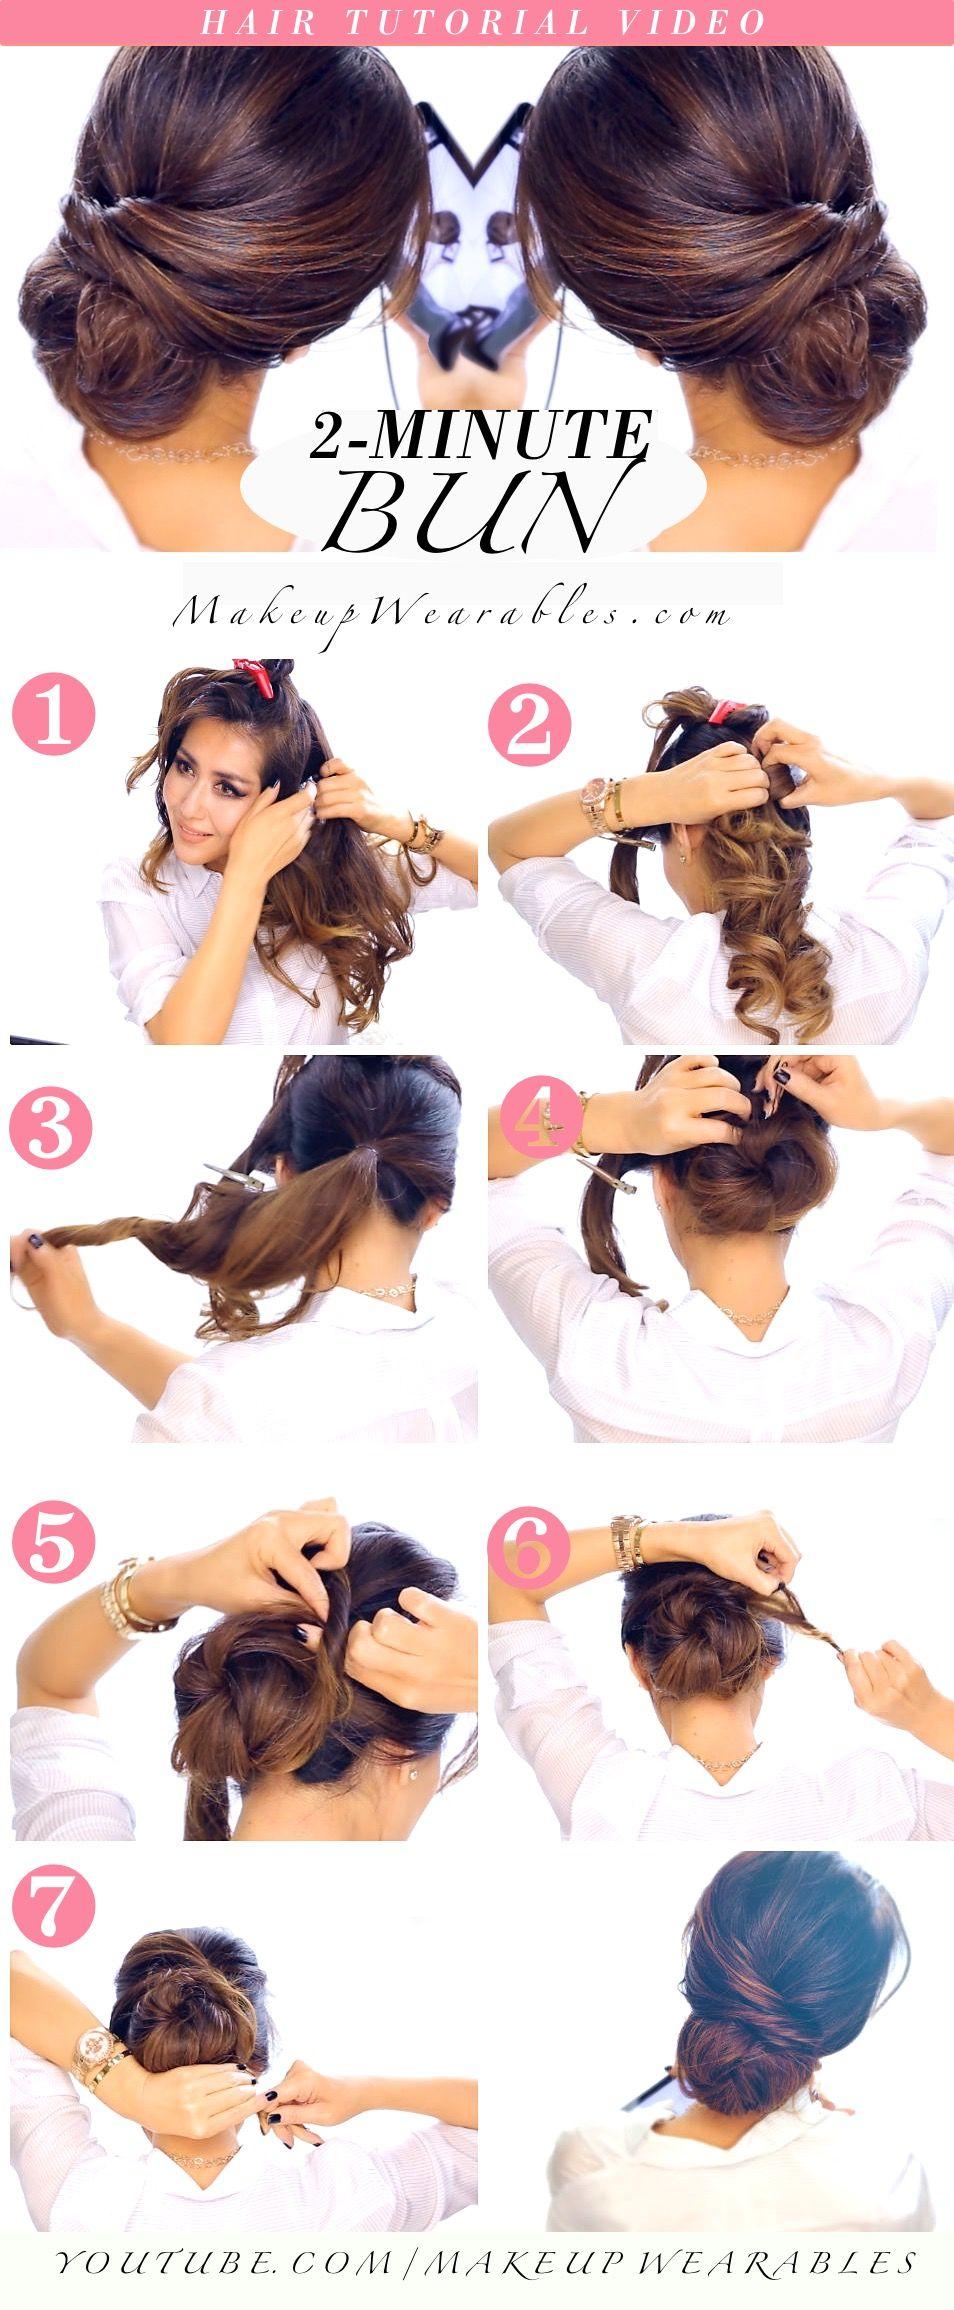 Peachy Elegant Bun Bun Hairstyles And Buns On Pinterest Short Hairstyles For Black Women Fulllsitofus